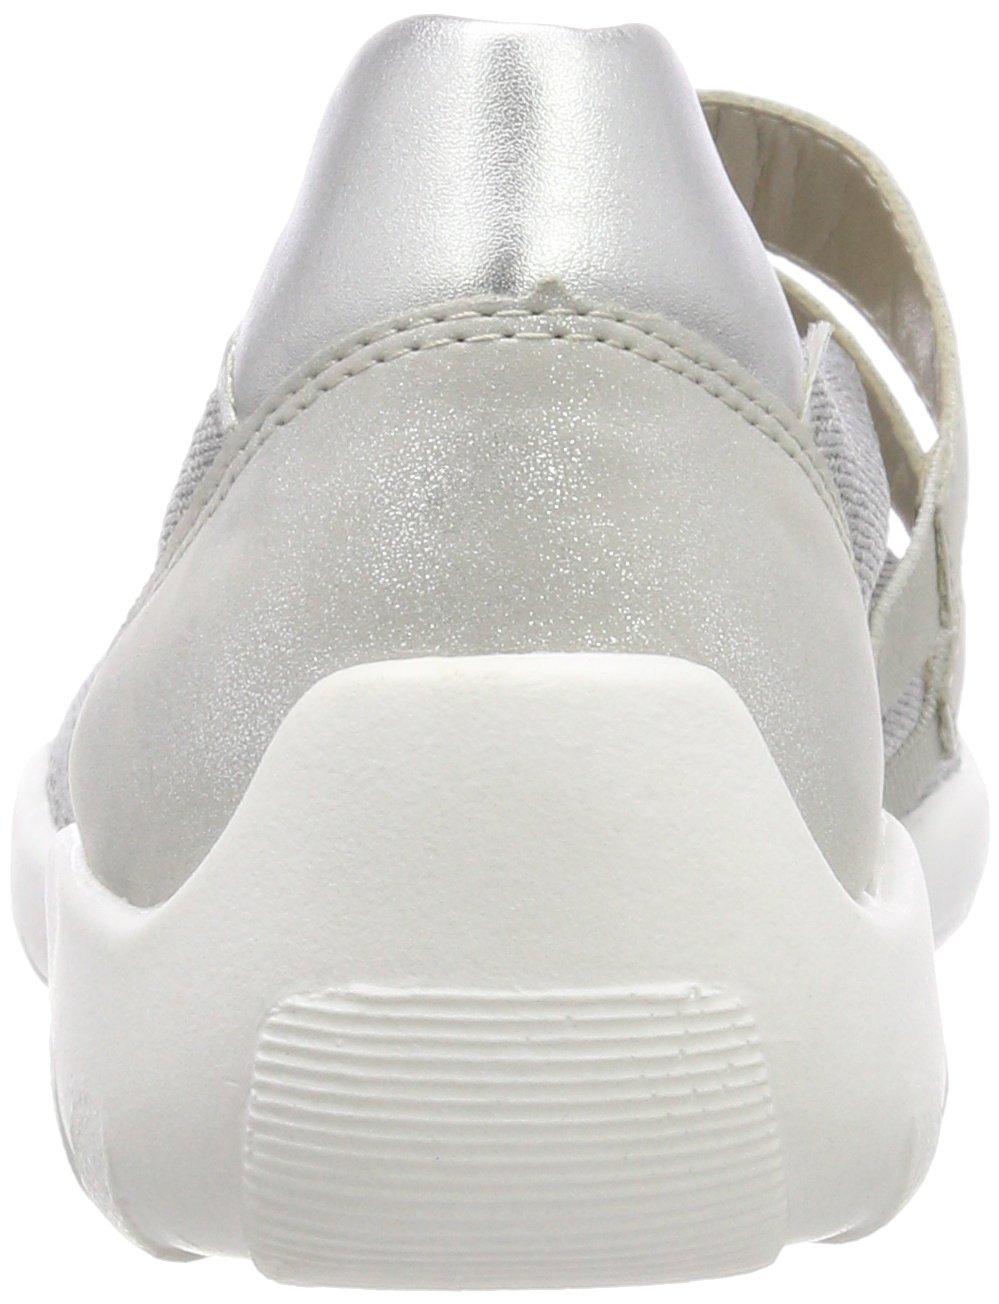 Remonte Grau Damen R3505 Geschlossene Ballerinas Grau Remonte (Grau/Silver) 1f5406